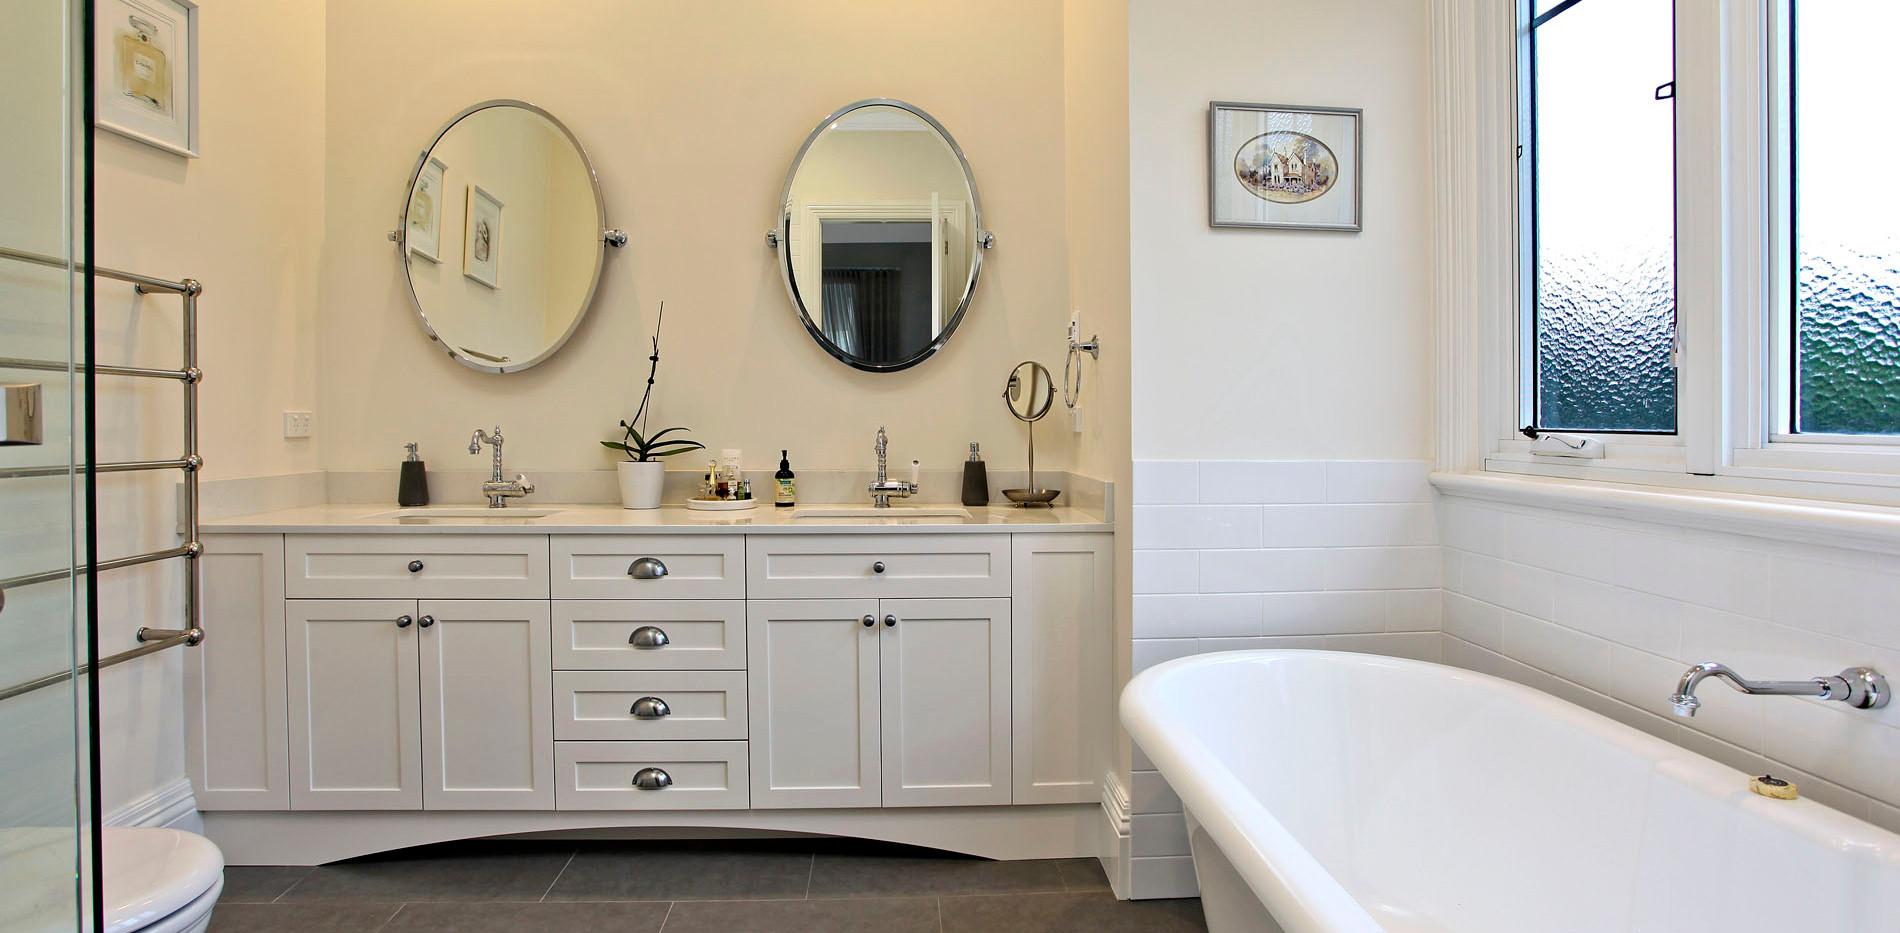 Hawkesbury bathrooms and Kitchens (23)